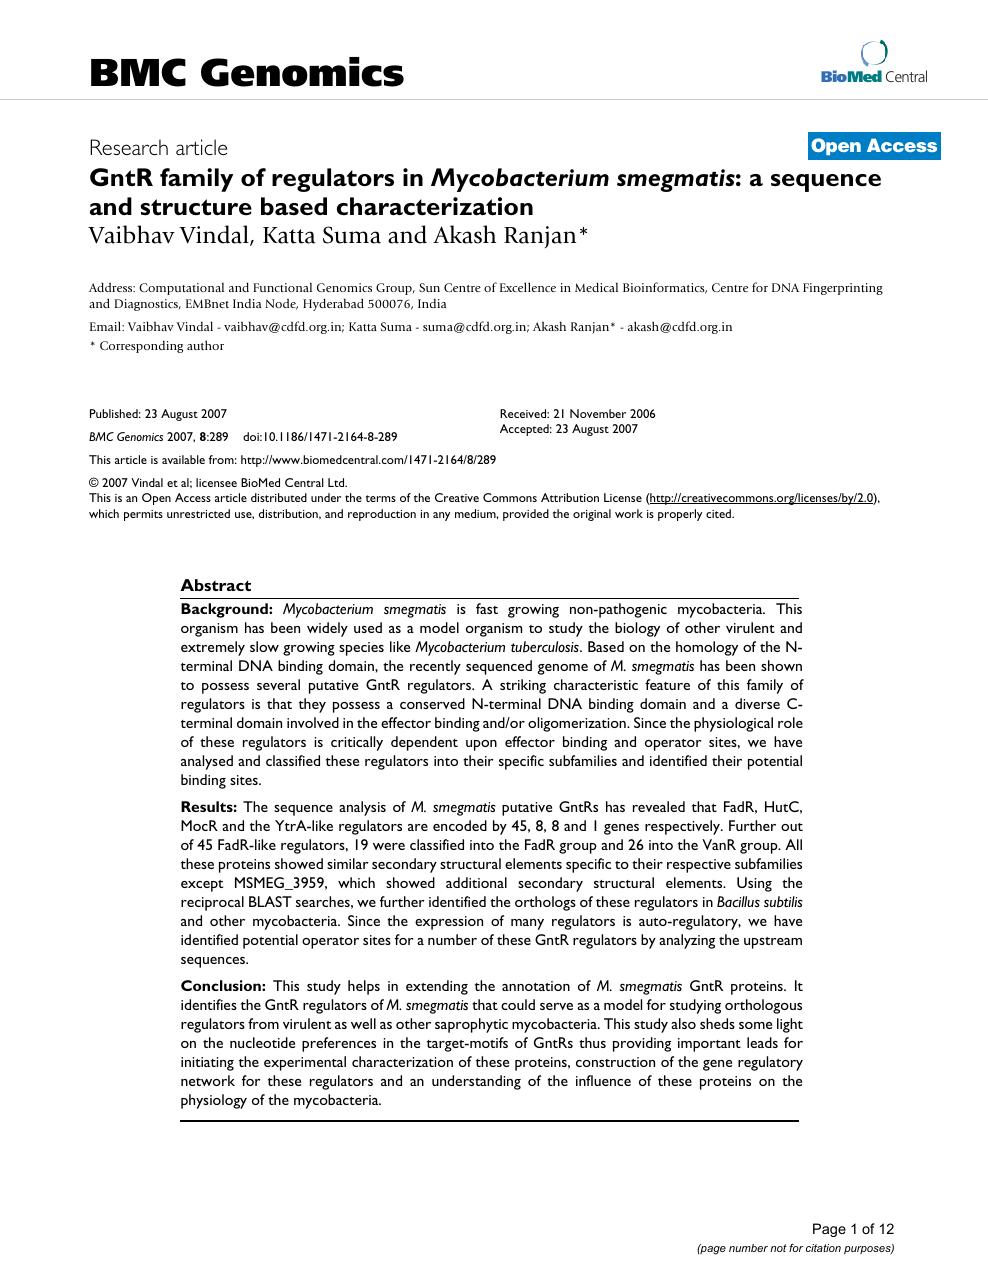 GntR family of regulators in Mycobacterium smegmatis: a